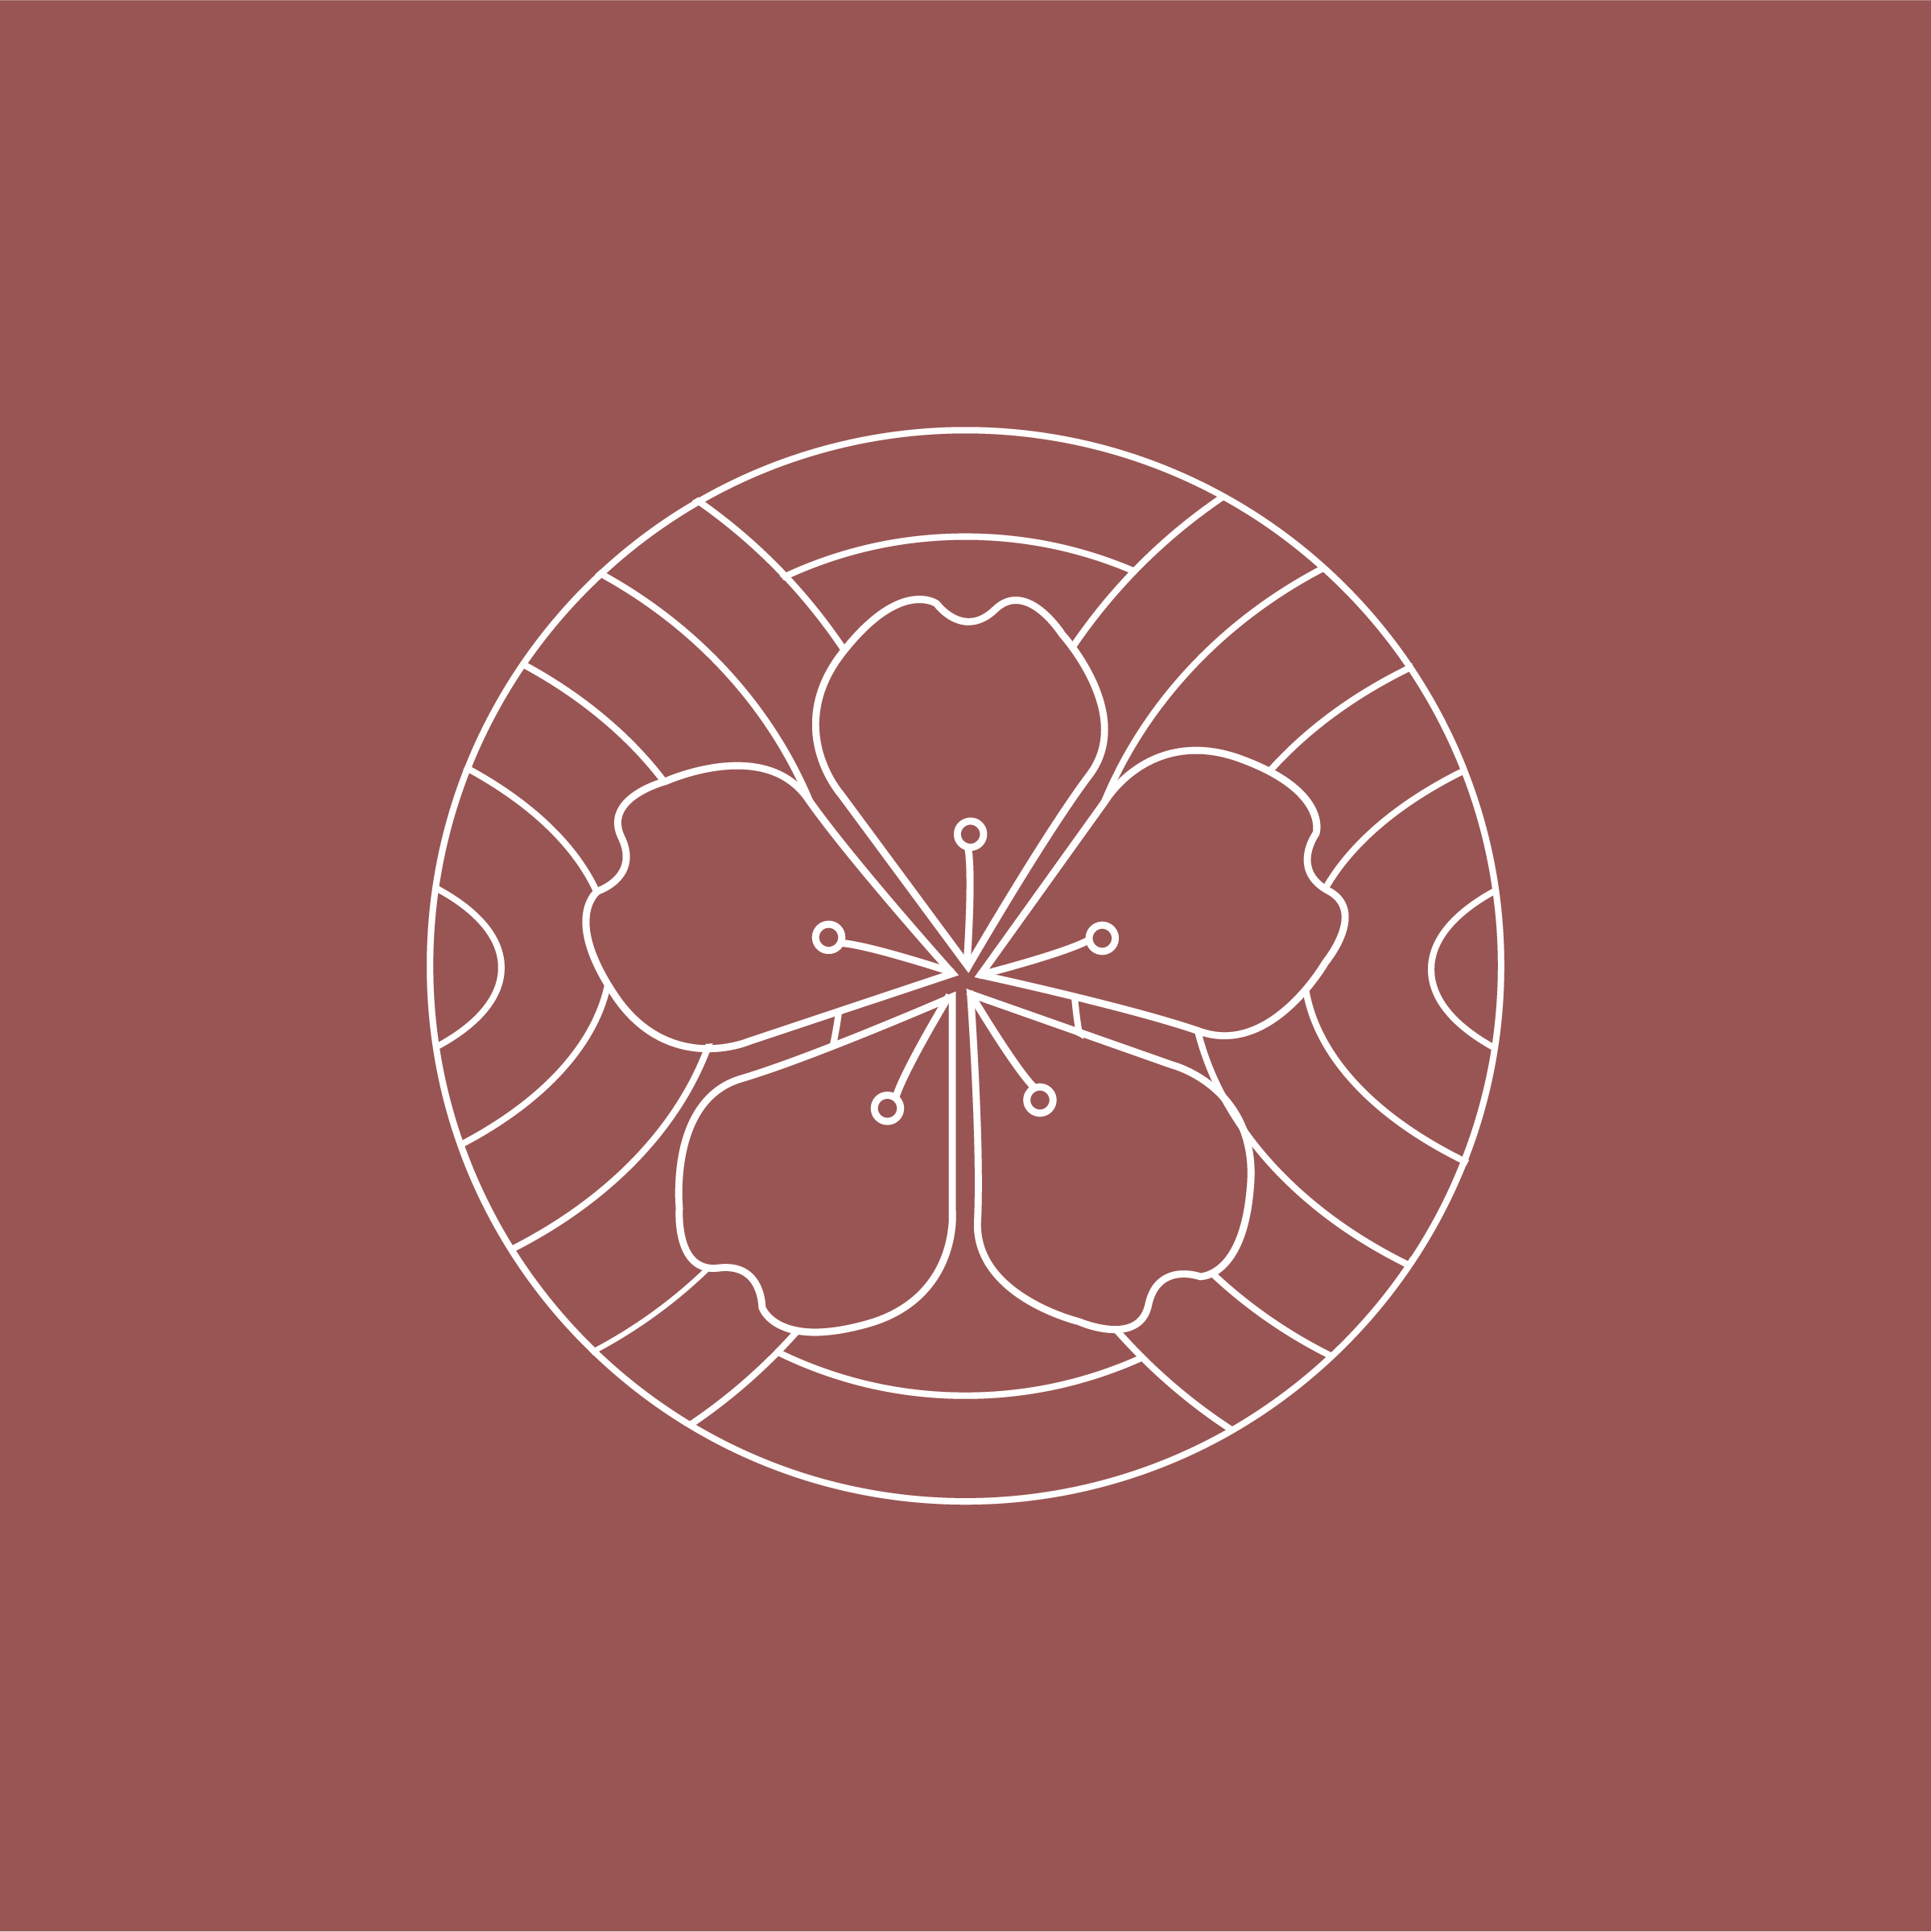 Cherry blossom healing arts branding design studio antheia.png